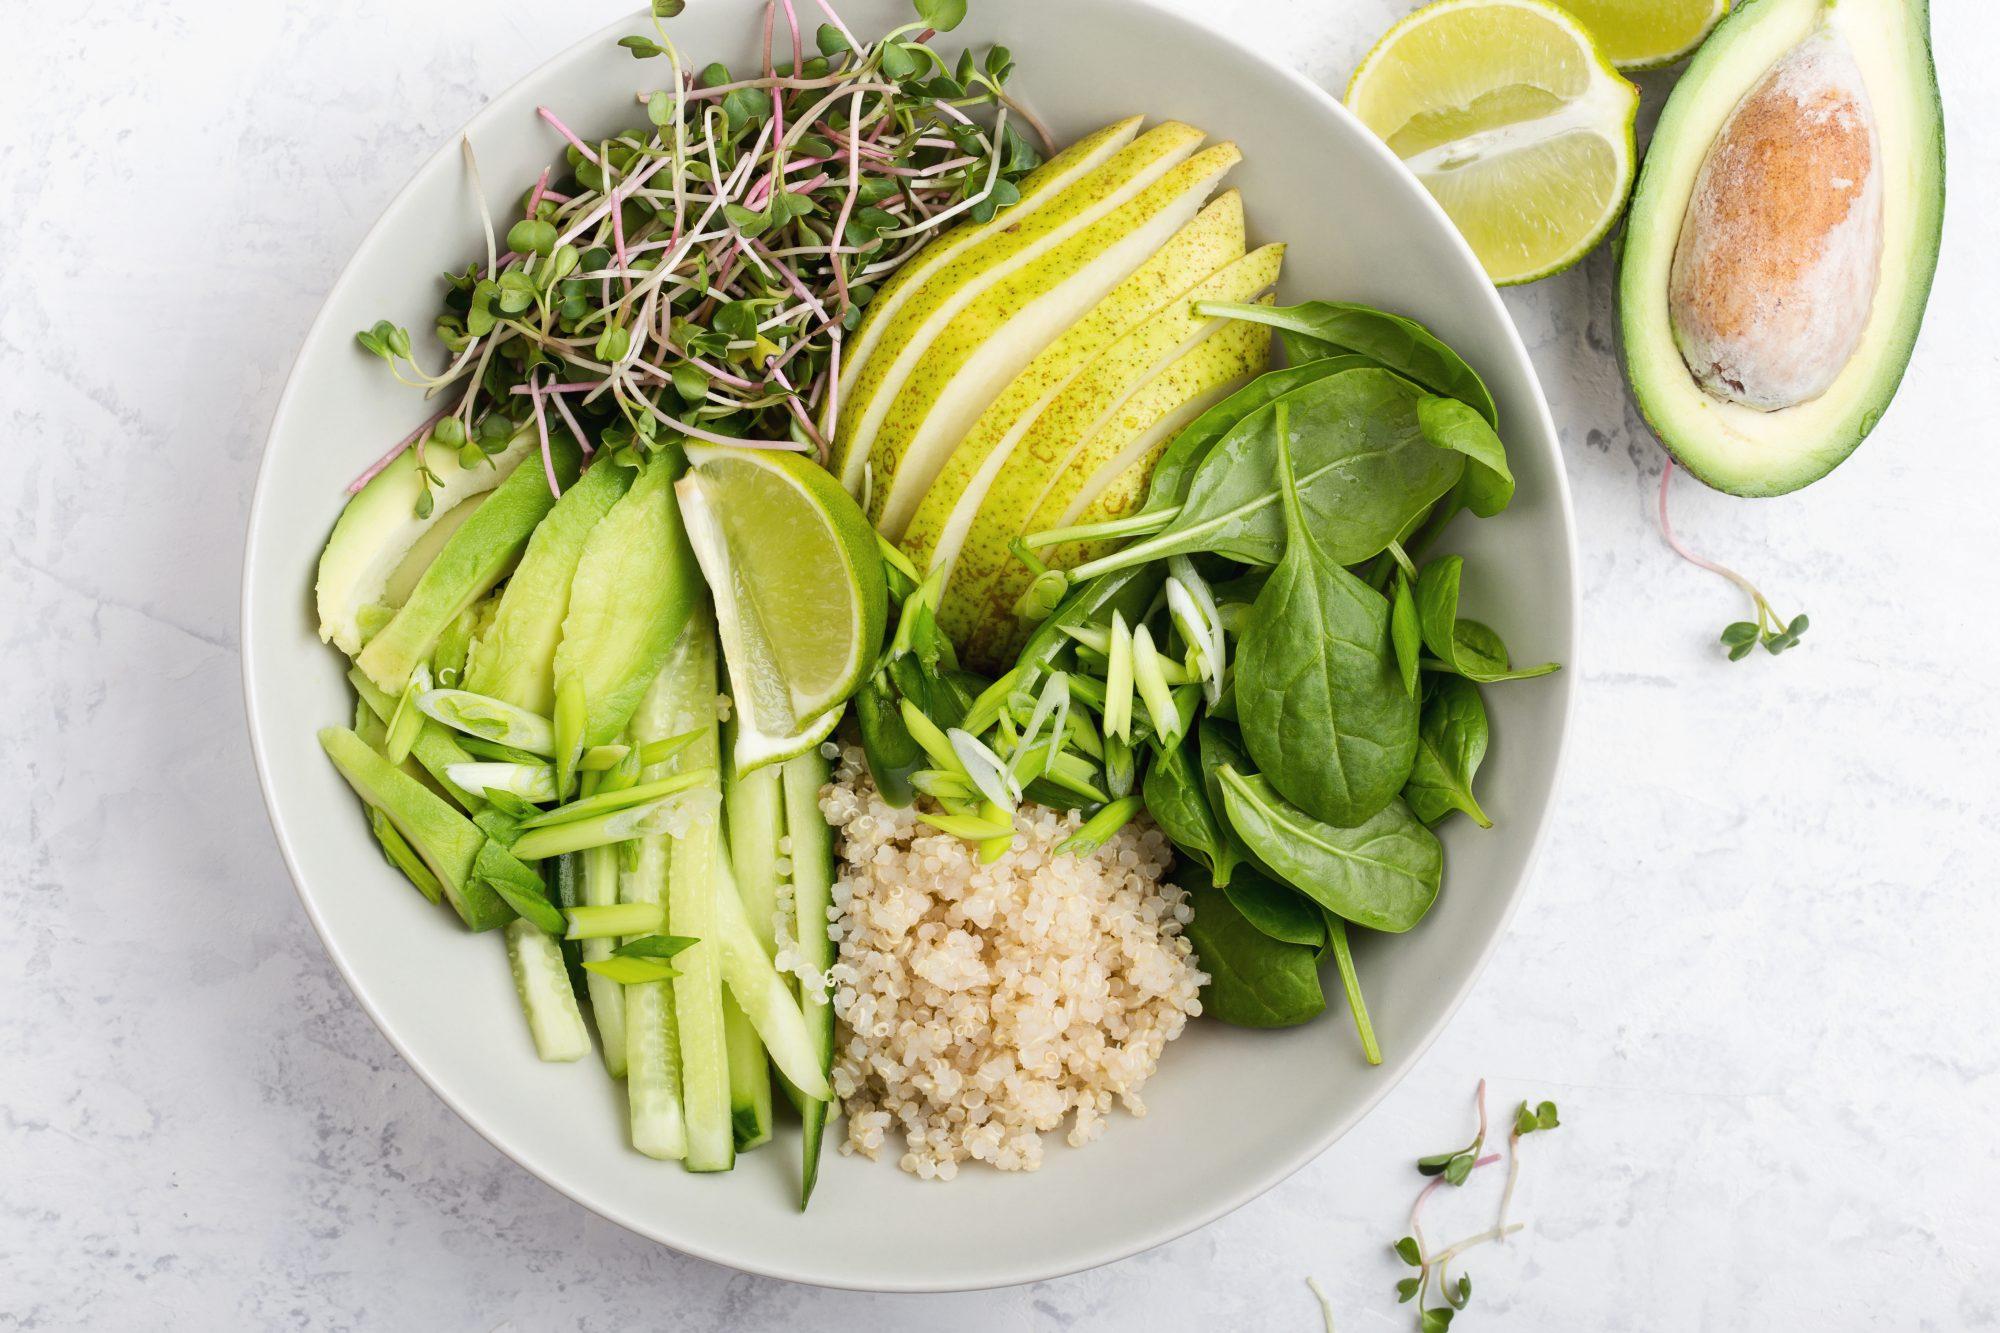 Salad Getty 2/7/20